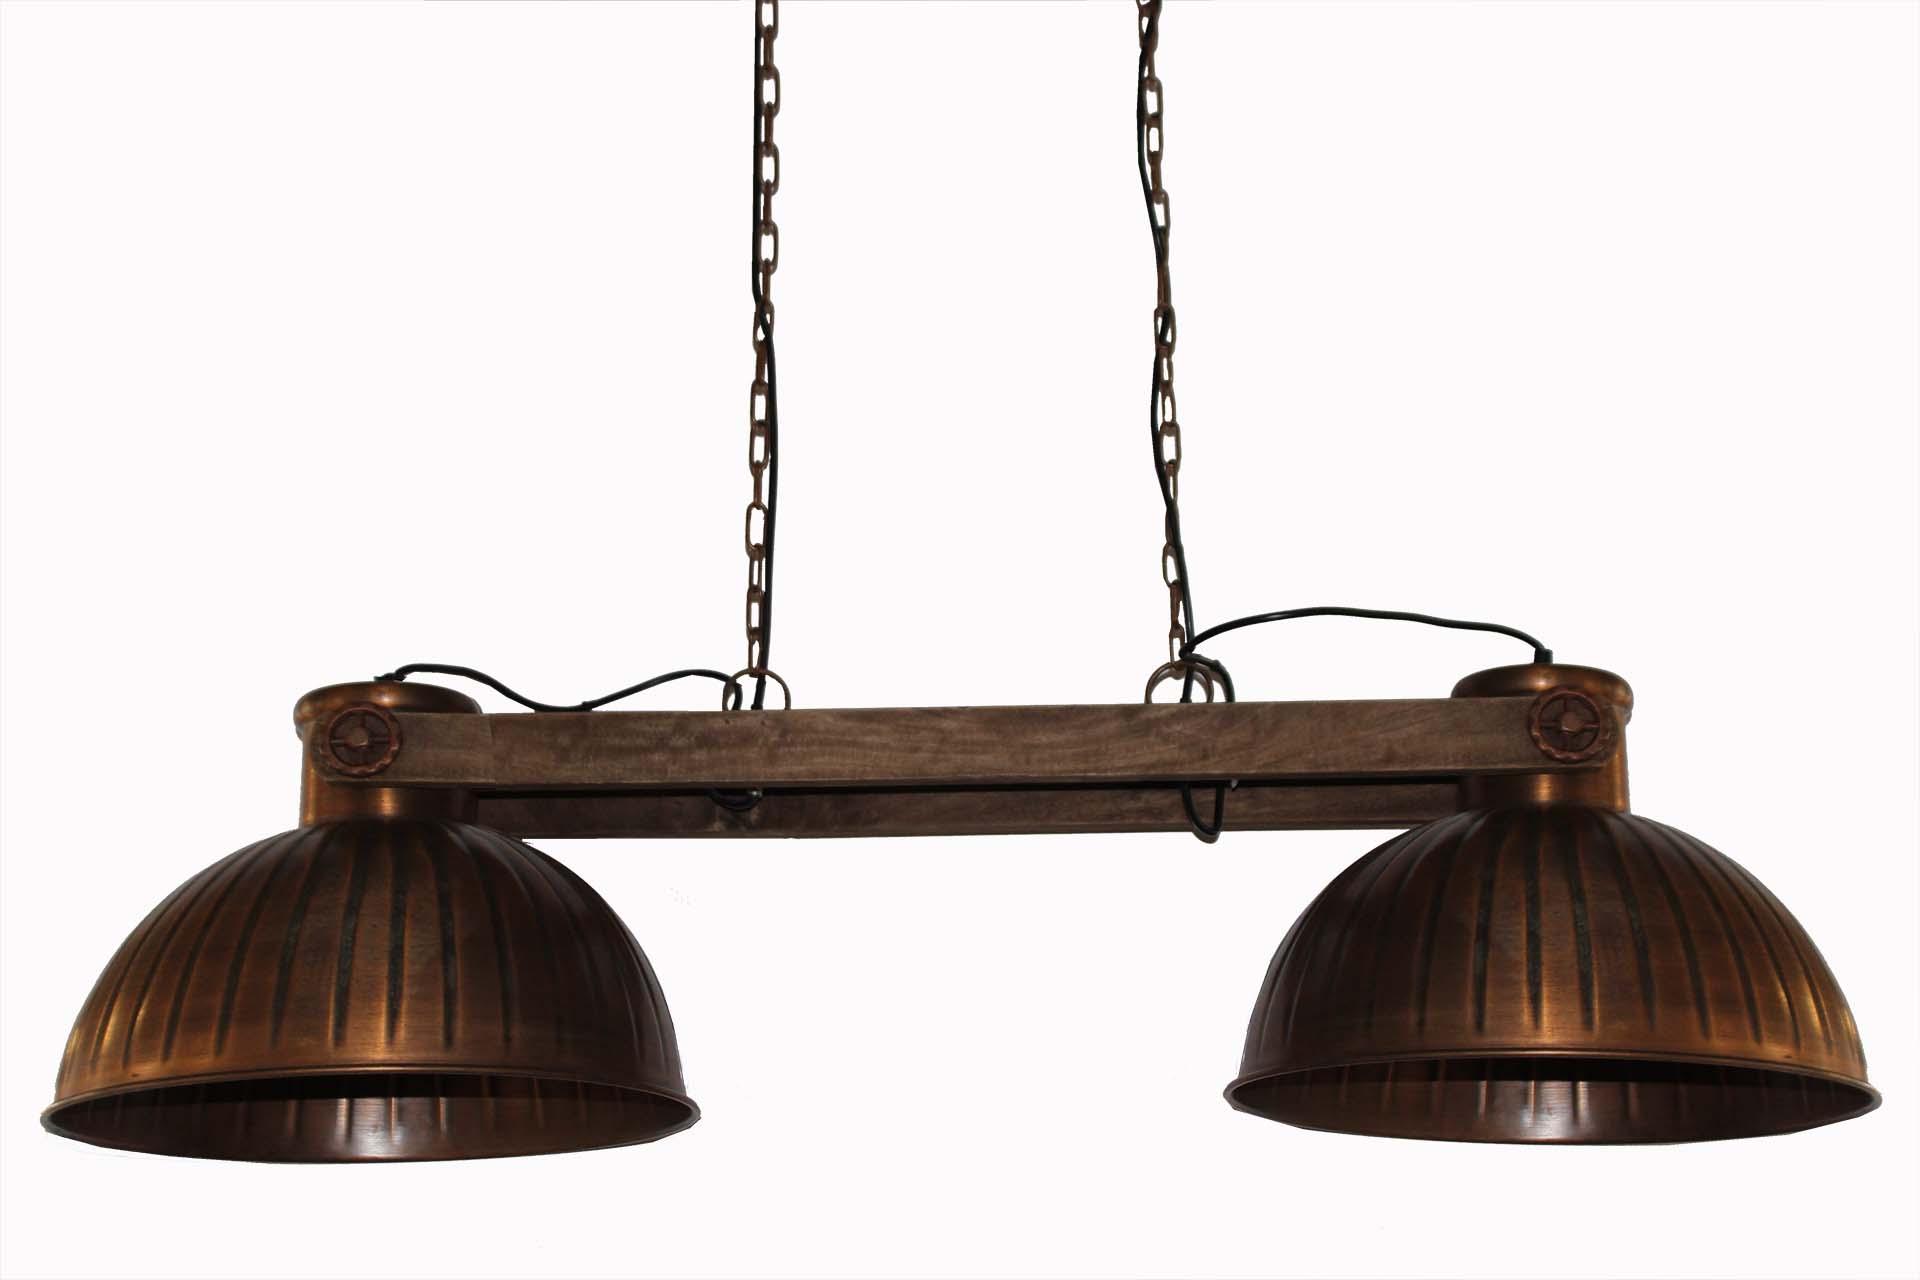 Lampa Sufitowa Industrialna Miedziana Indigodecor